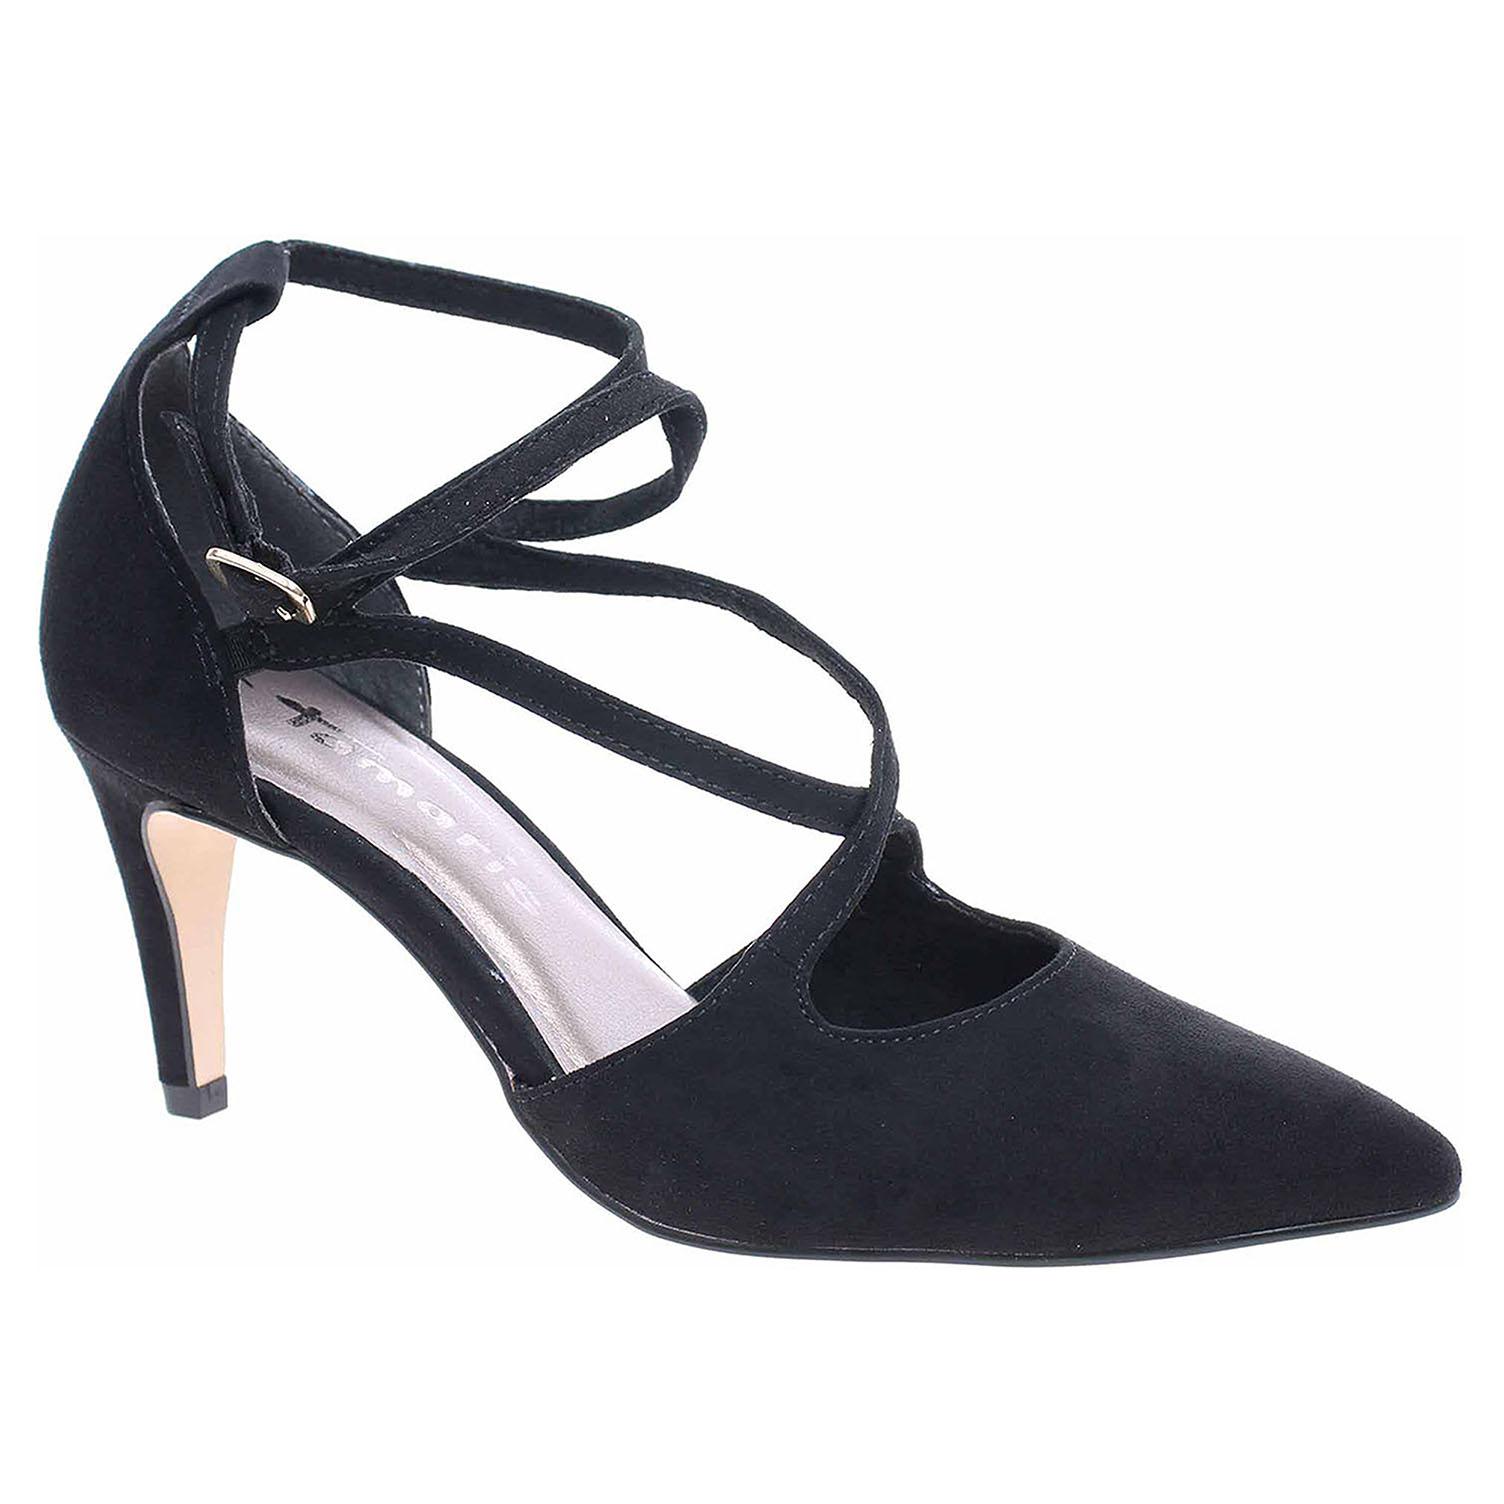 3fba1baa736a Ecco Dámská společenská obuv Tamaris 1-24440-22 black 22901437